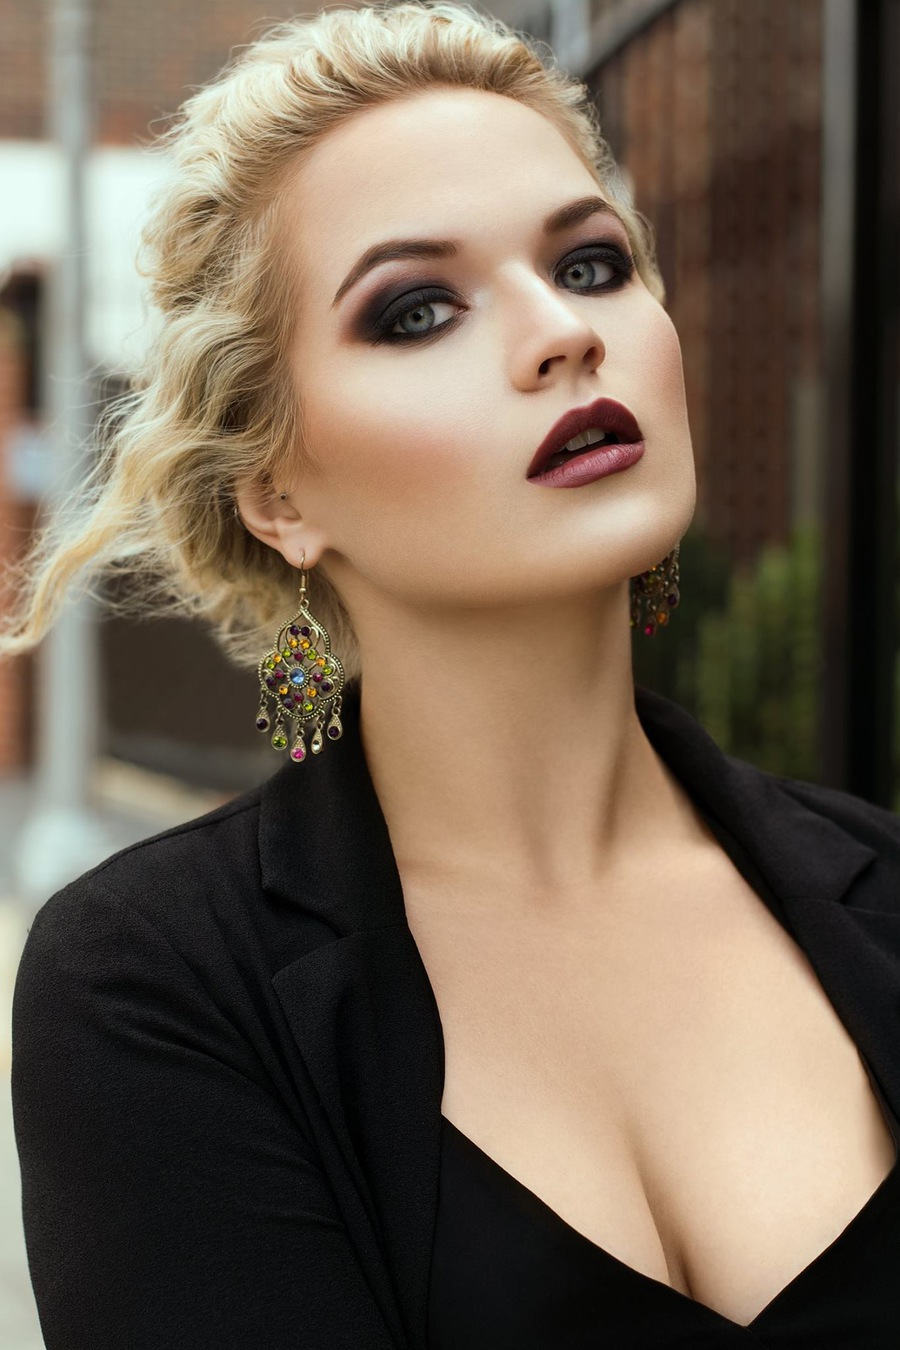 Smoke / Model Jessica Megan / Uploaded 14th July 2016 @ 10:14 PM